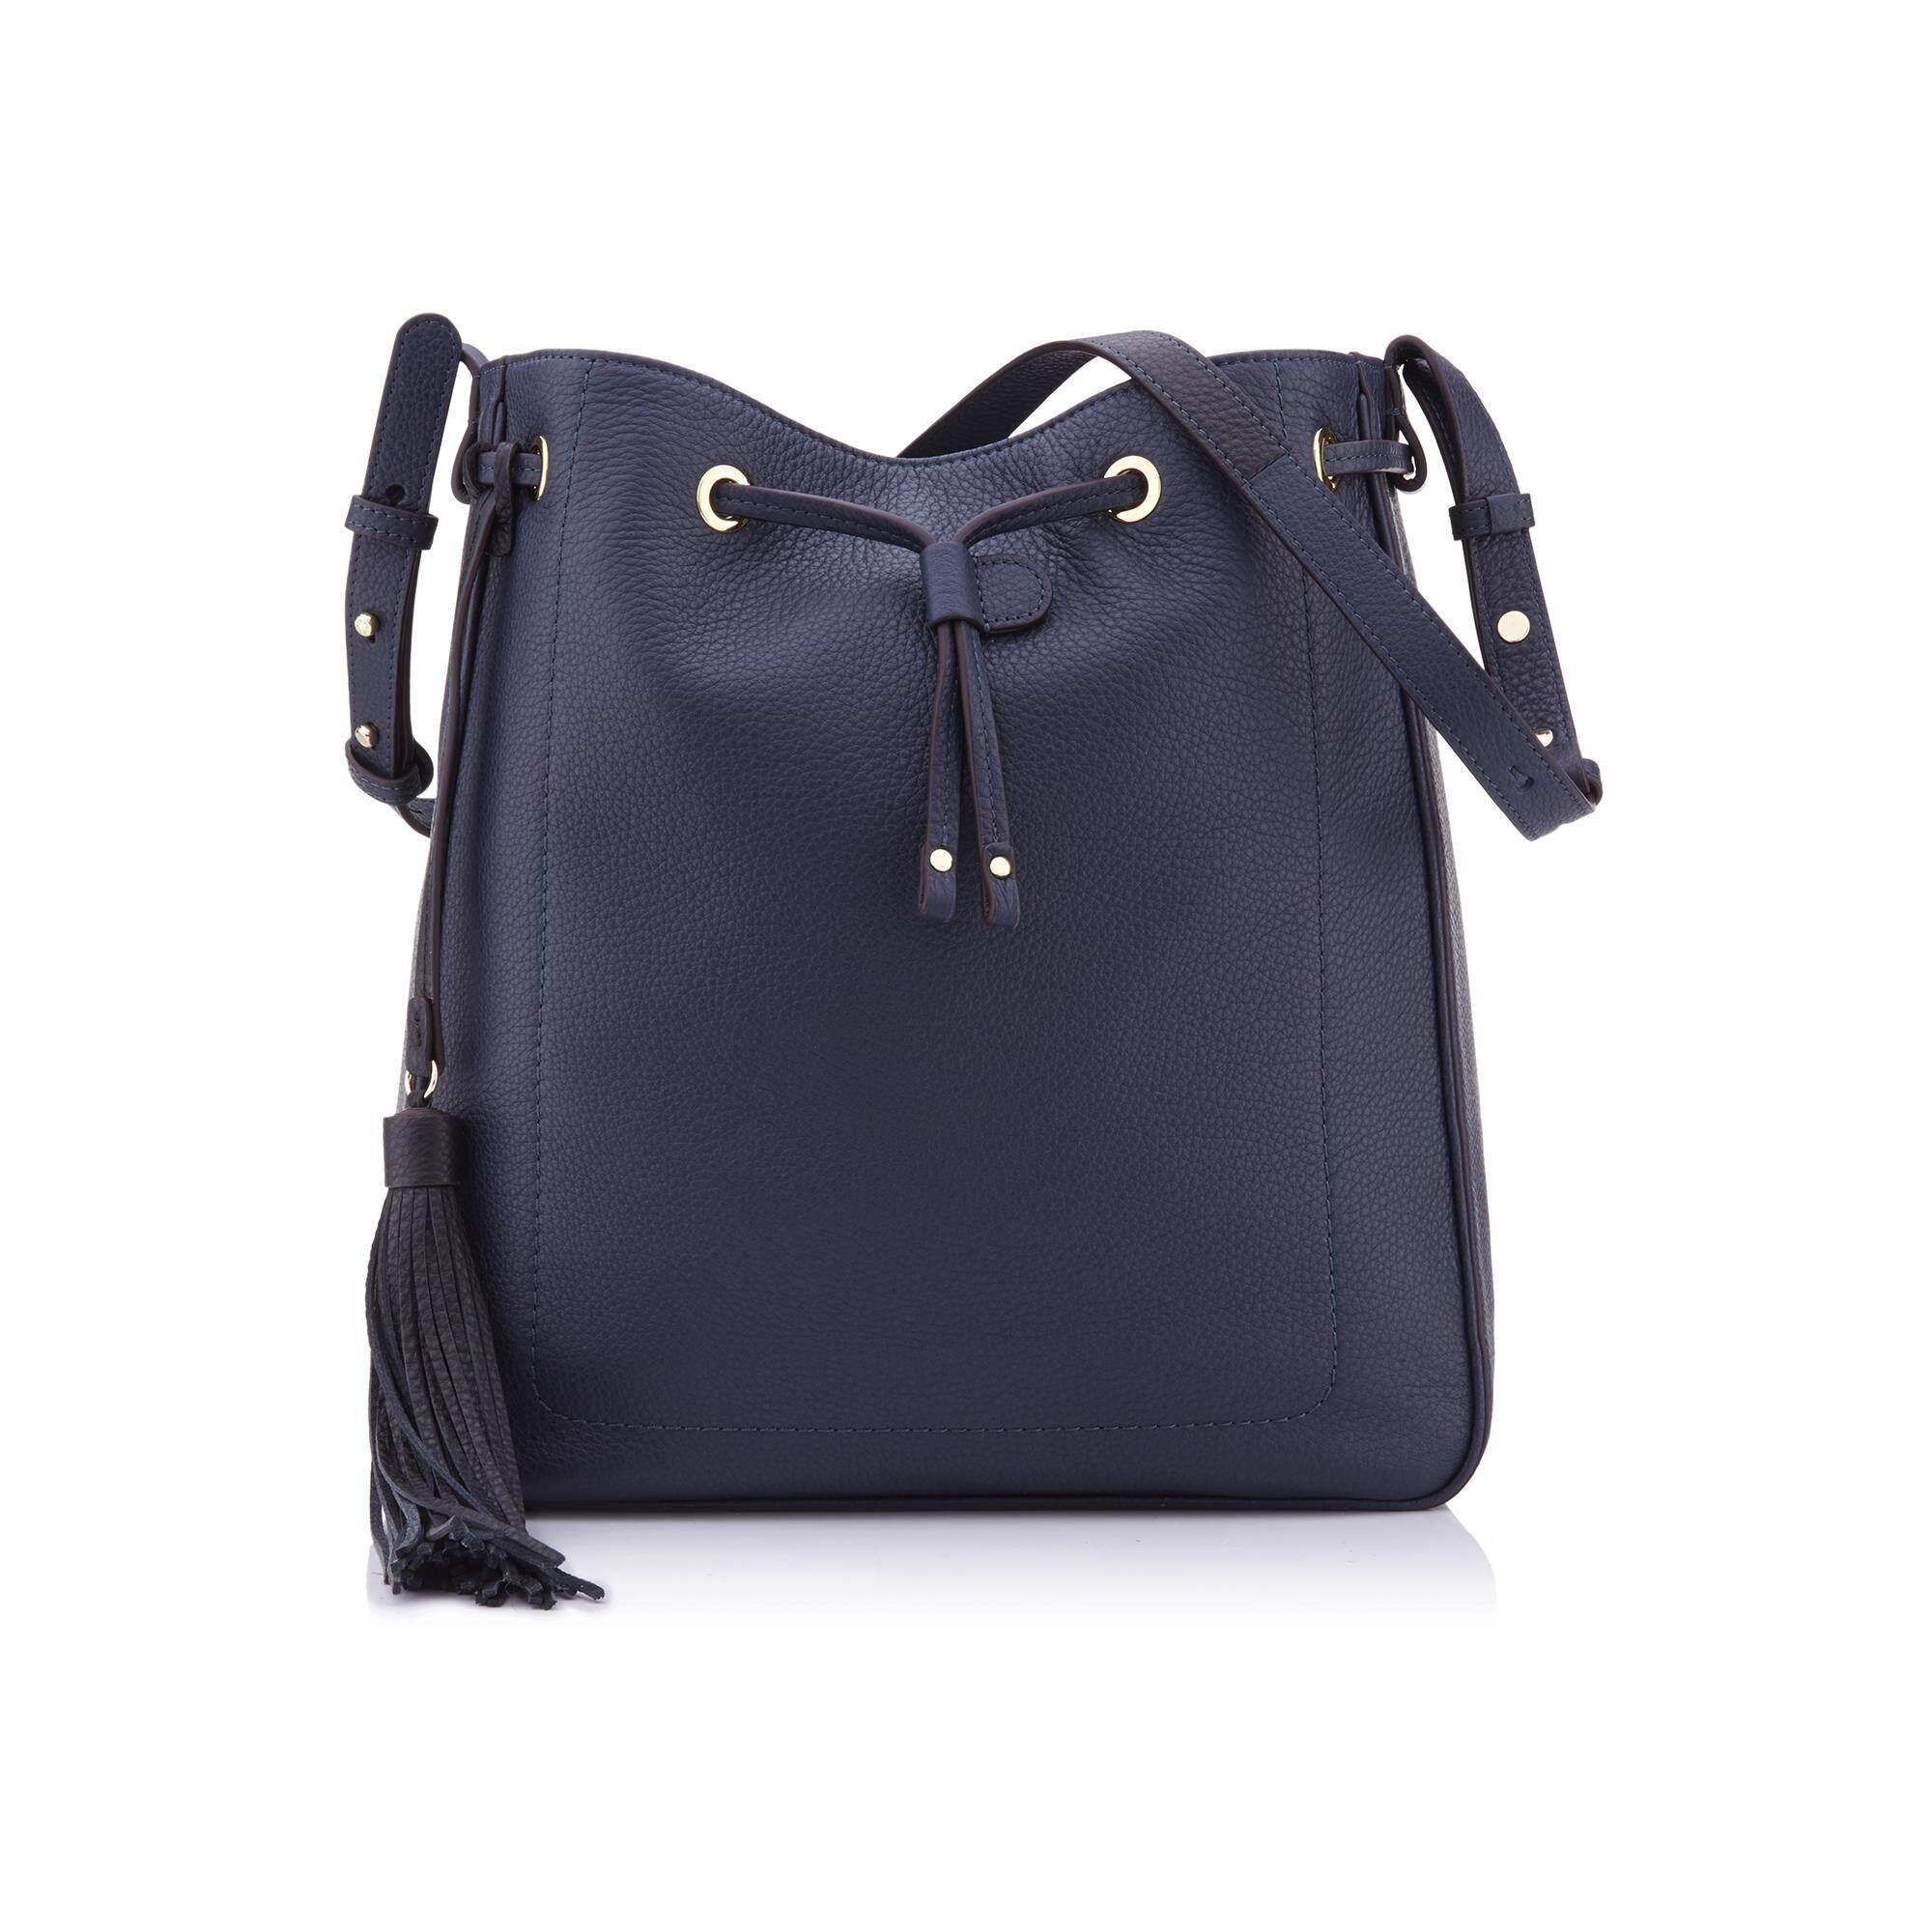 dac55ed78a4ae Bonia Women Top-Handle Bags price in Malaysia - Best Bonia Women Top ...